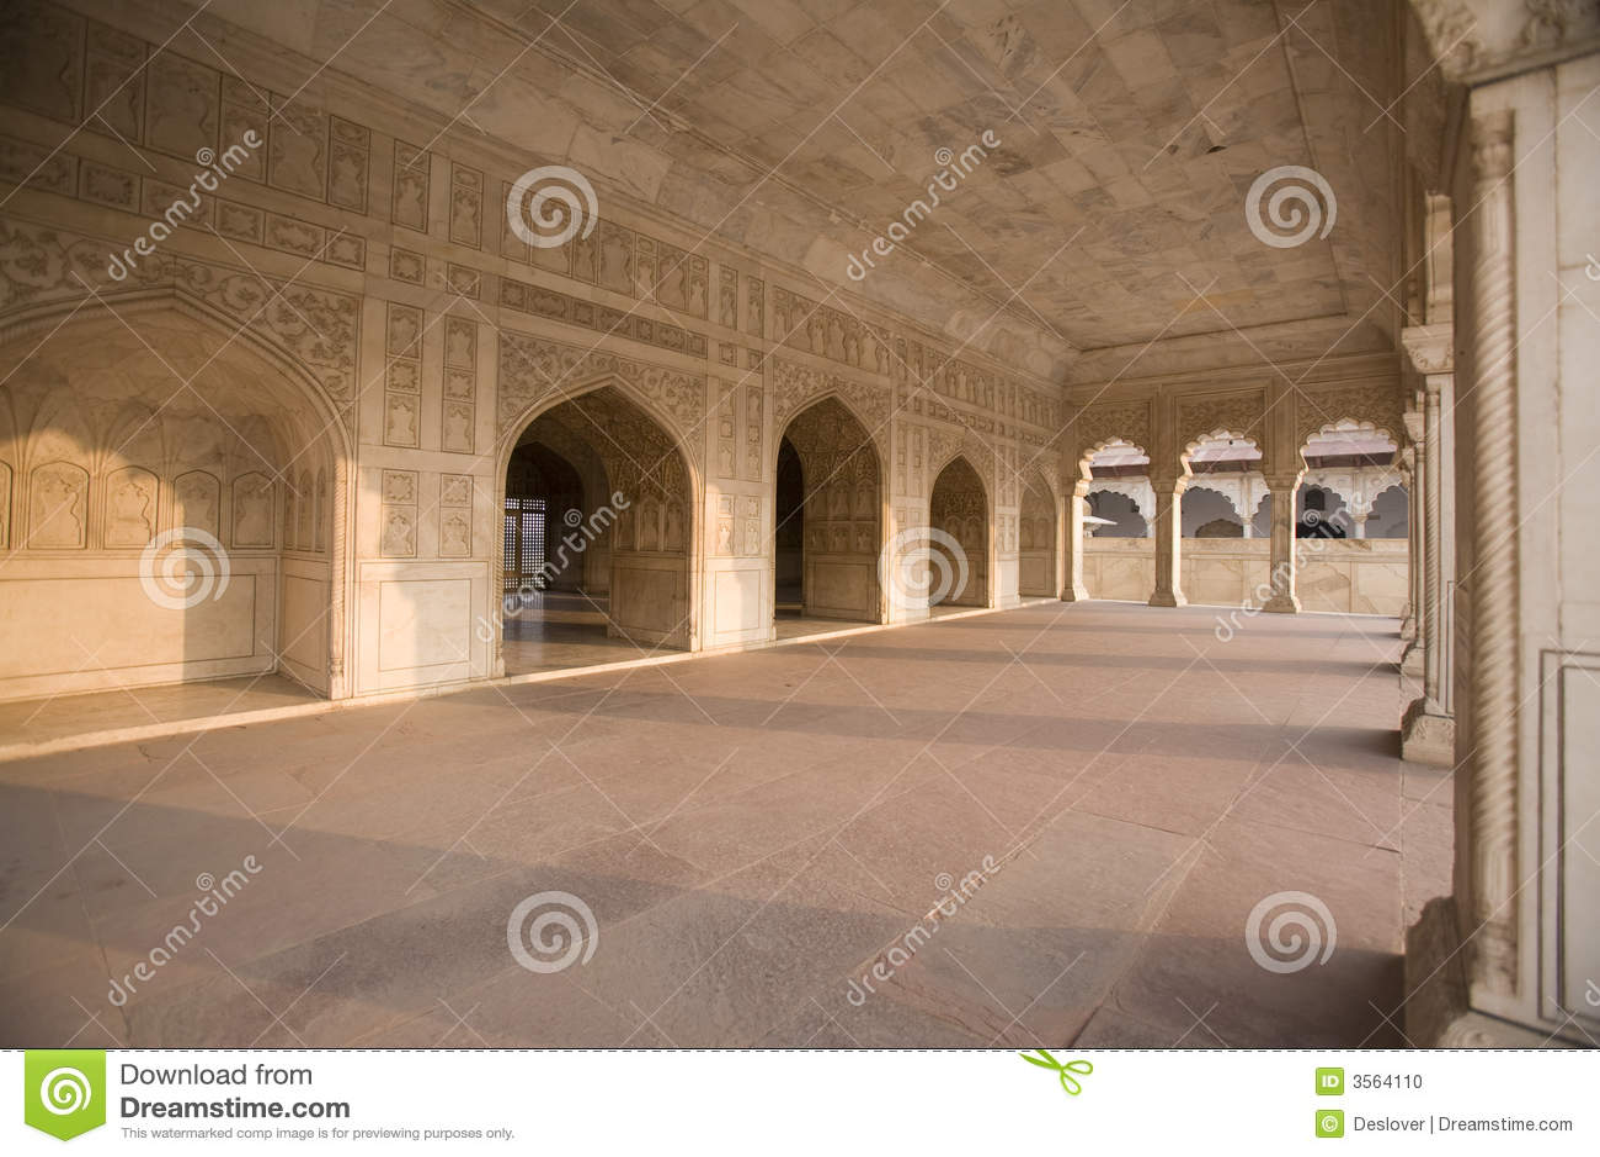 Fortificazione rossa - Agra, India